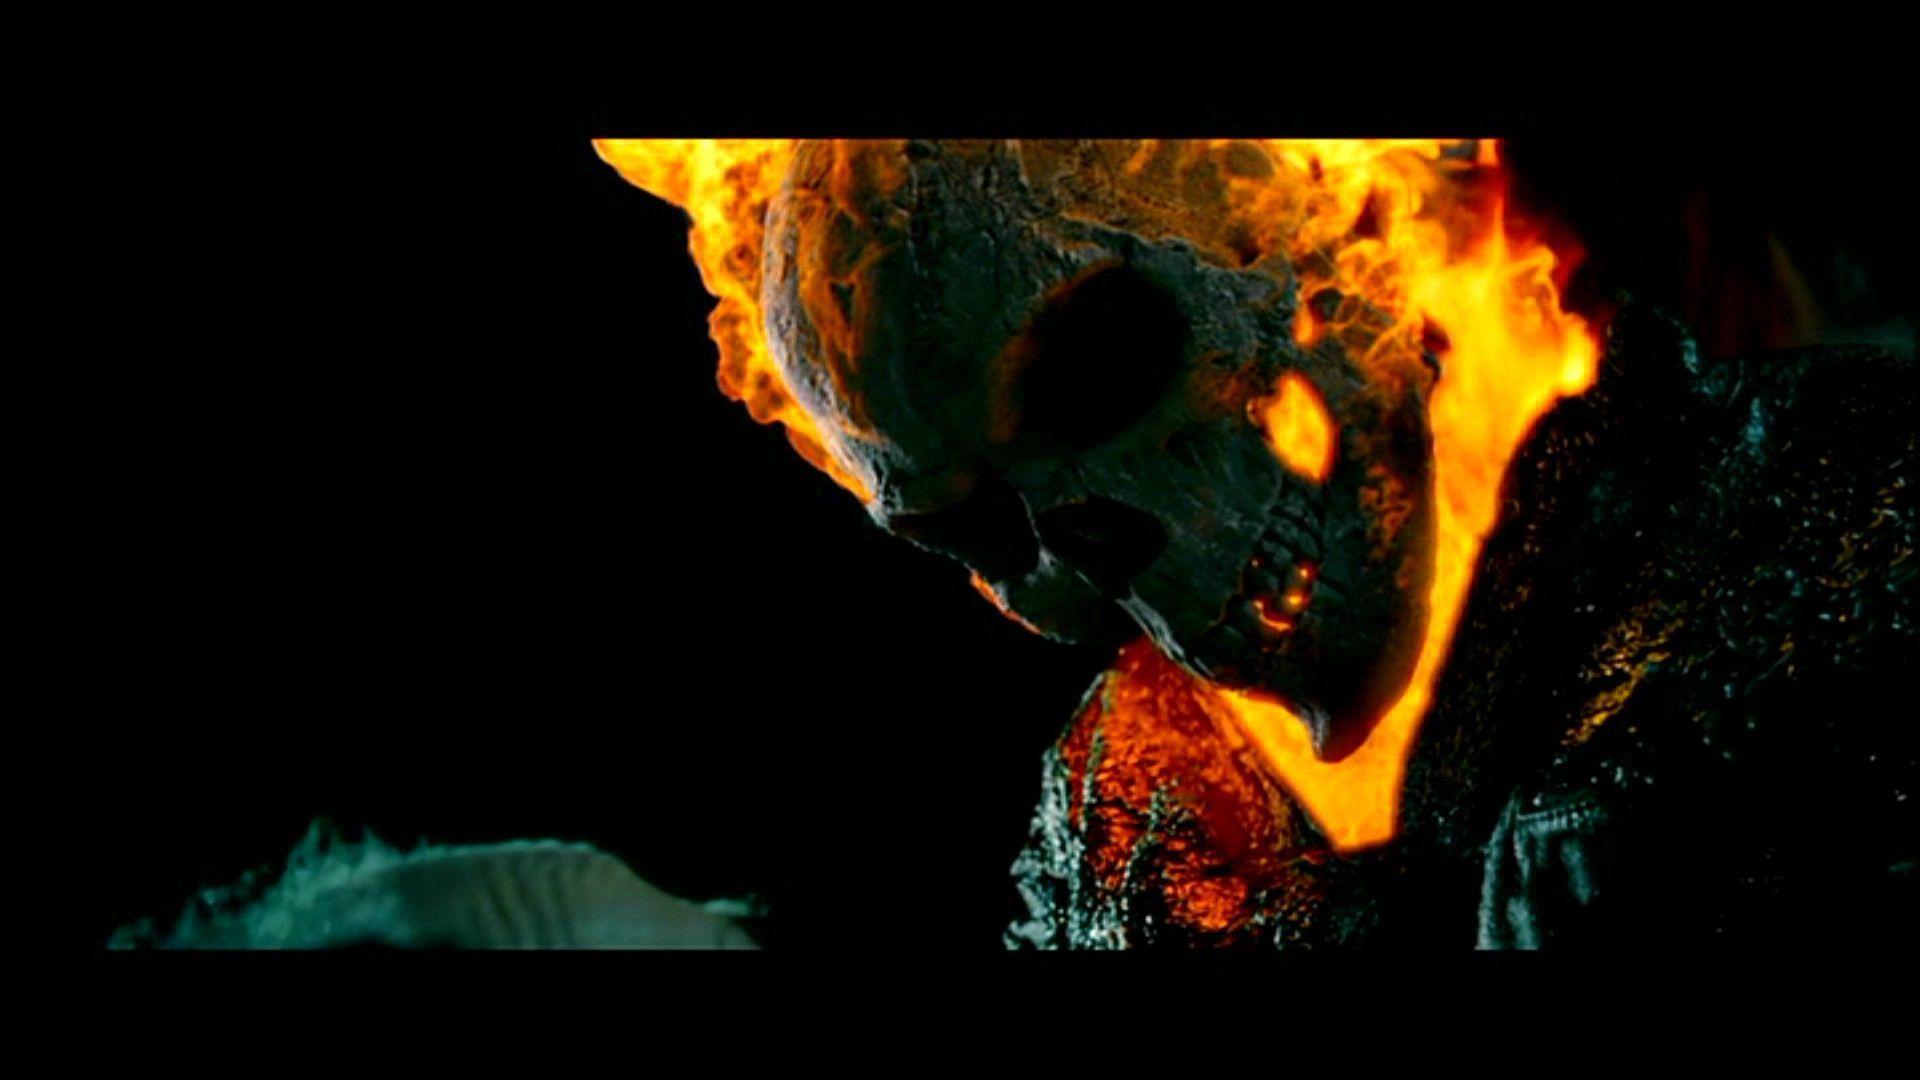 Beautiful Wallpaper Horse Ghost Rider - 054d22f680e5614d5a8819e0ac4b753d  Pic_672210.jpg